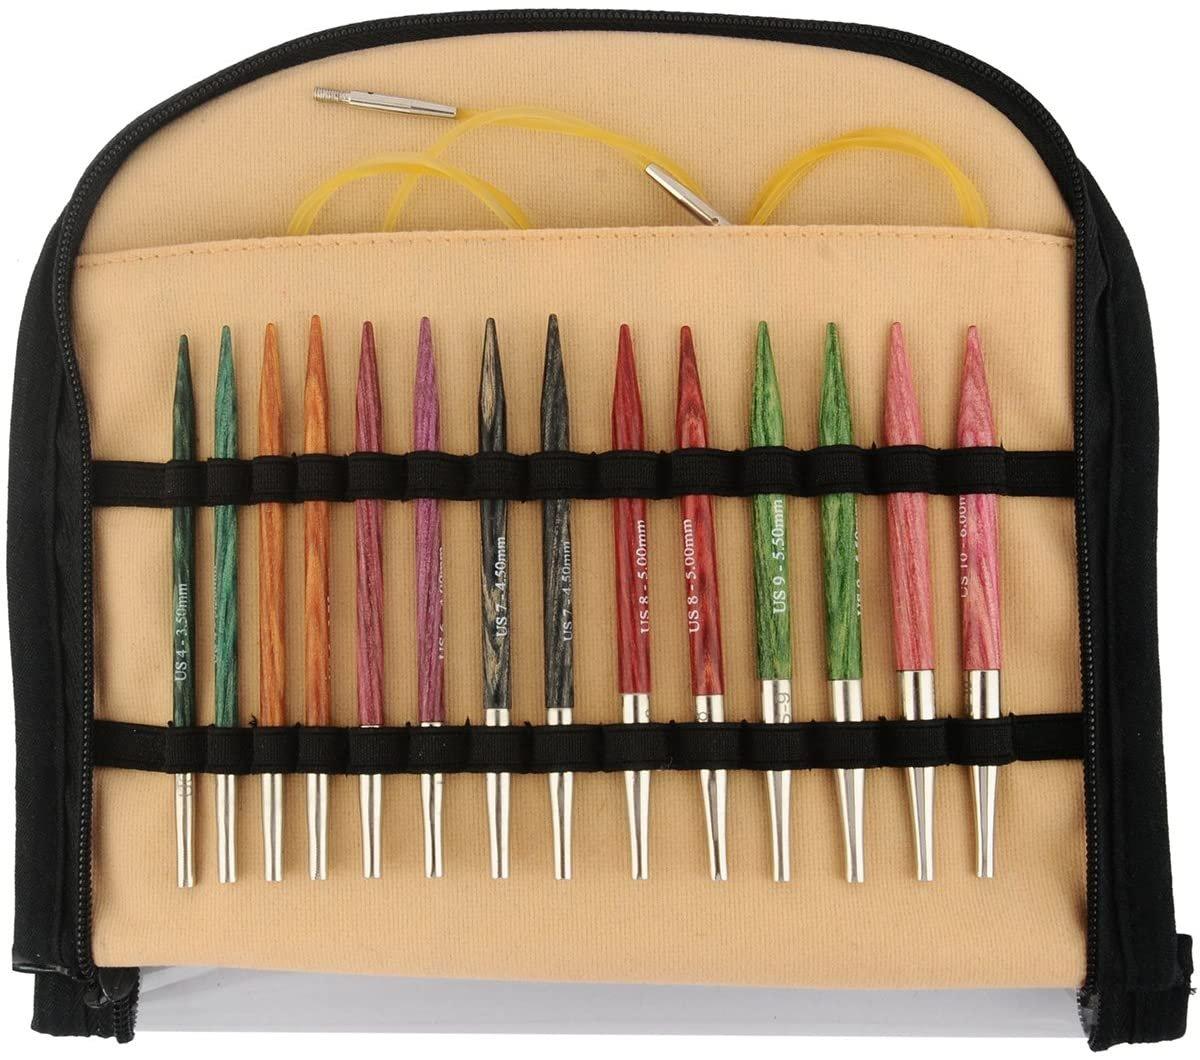 Knitter's Pride Dreamz Deluxe IC Needle Set